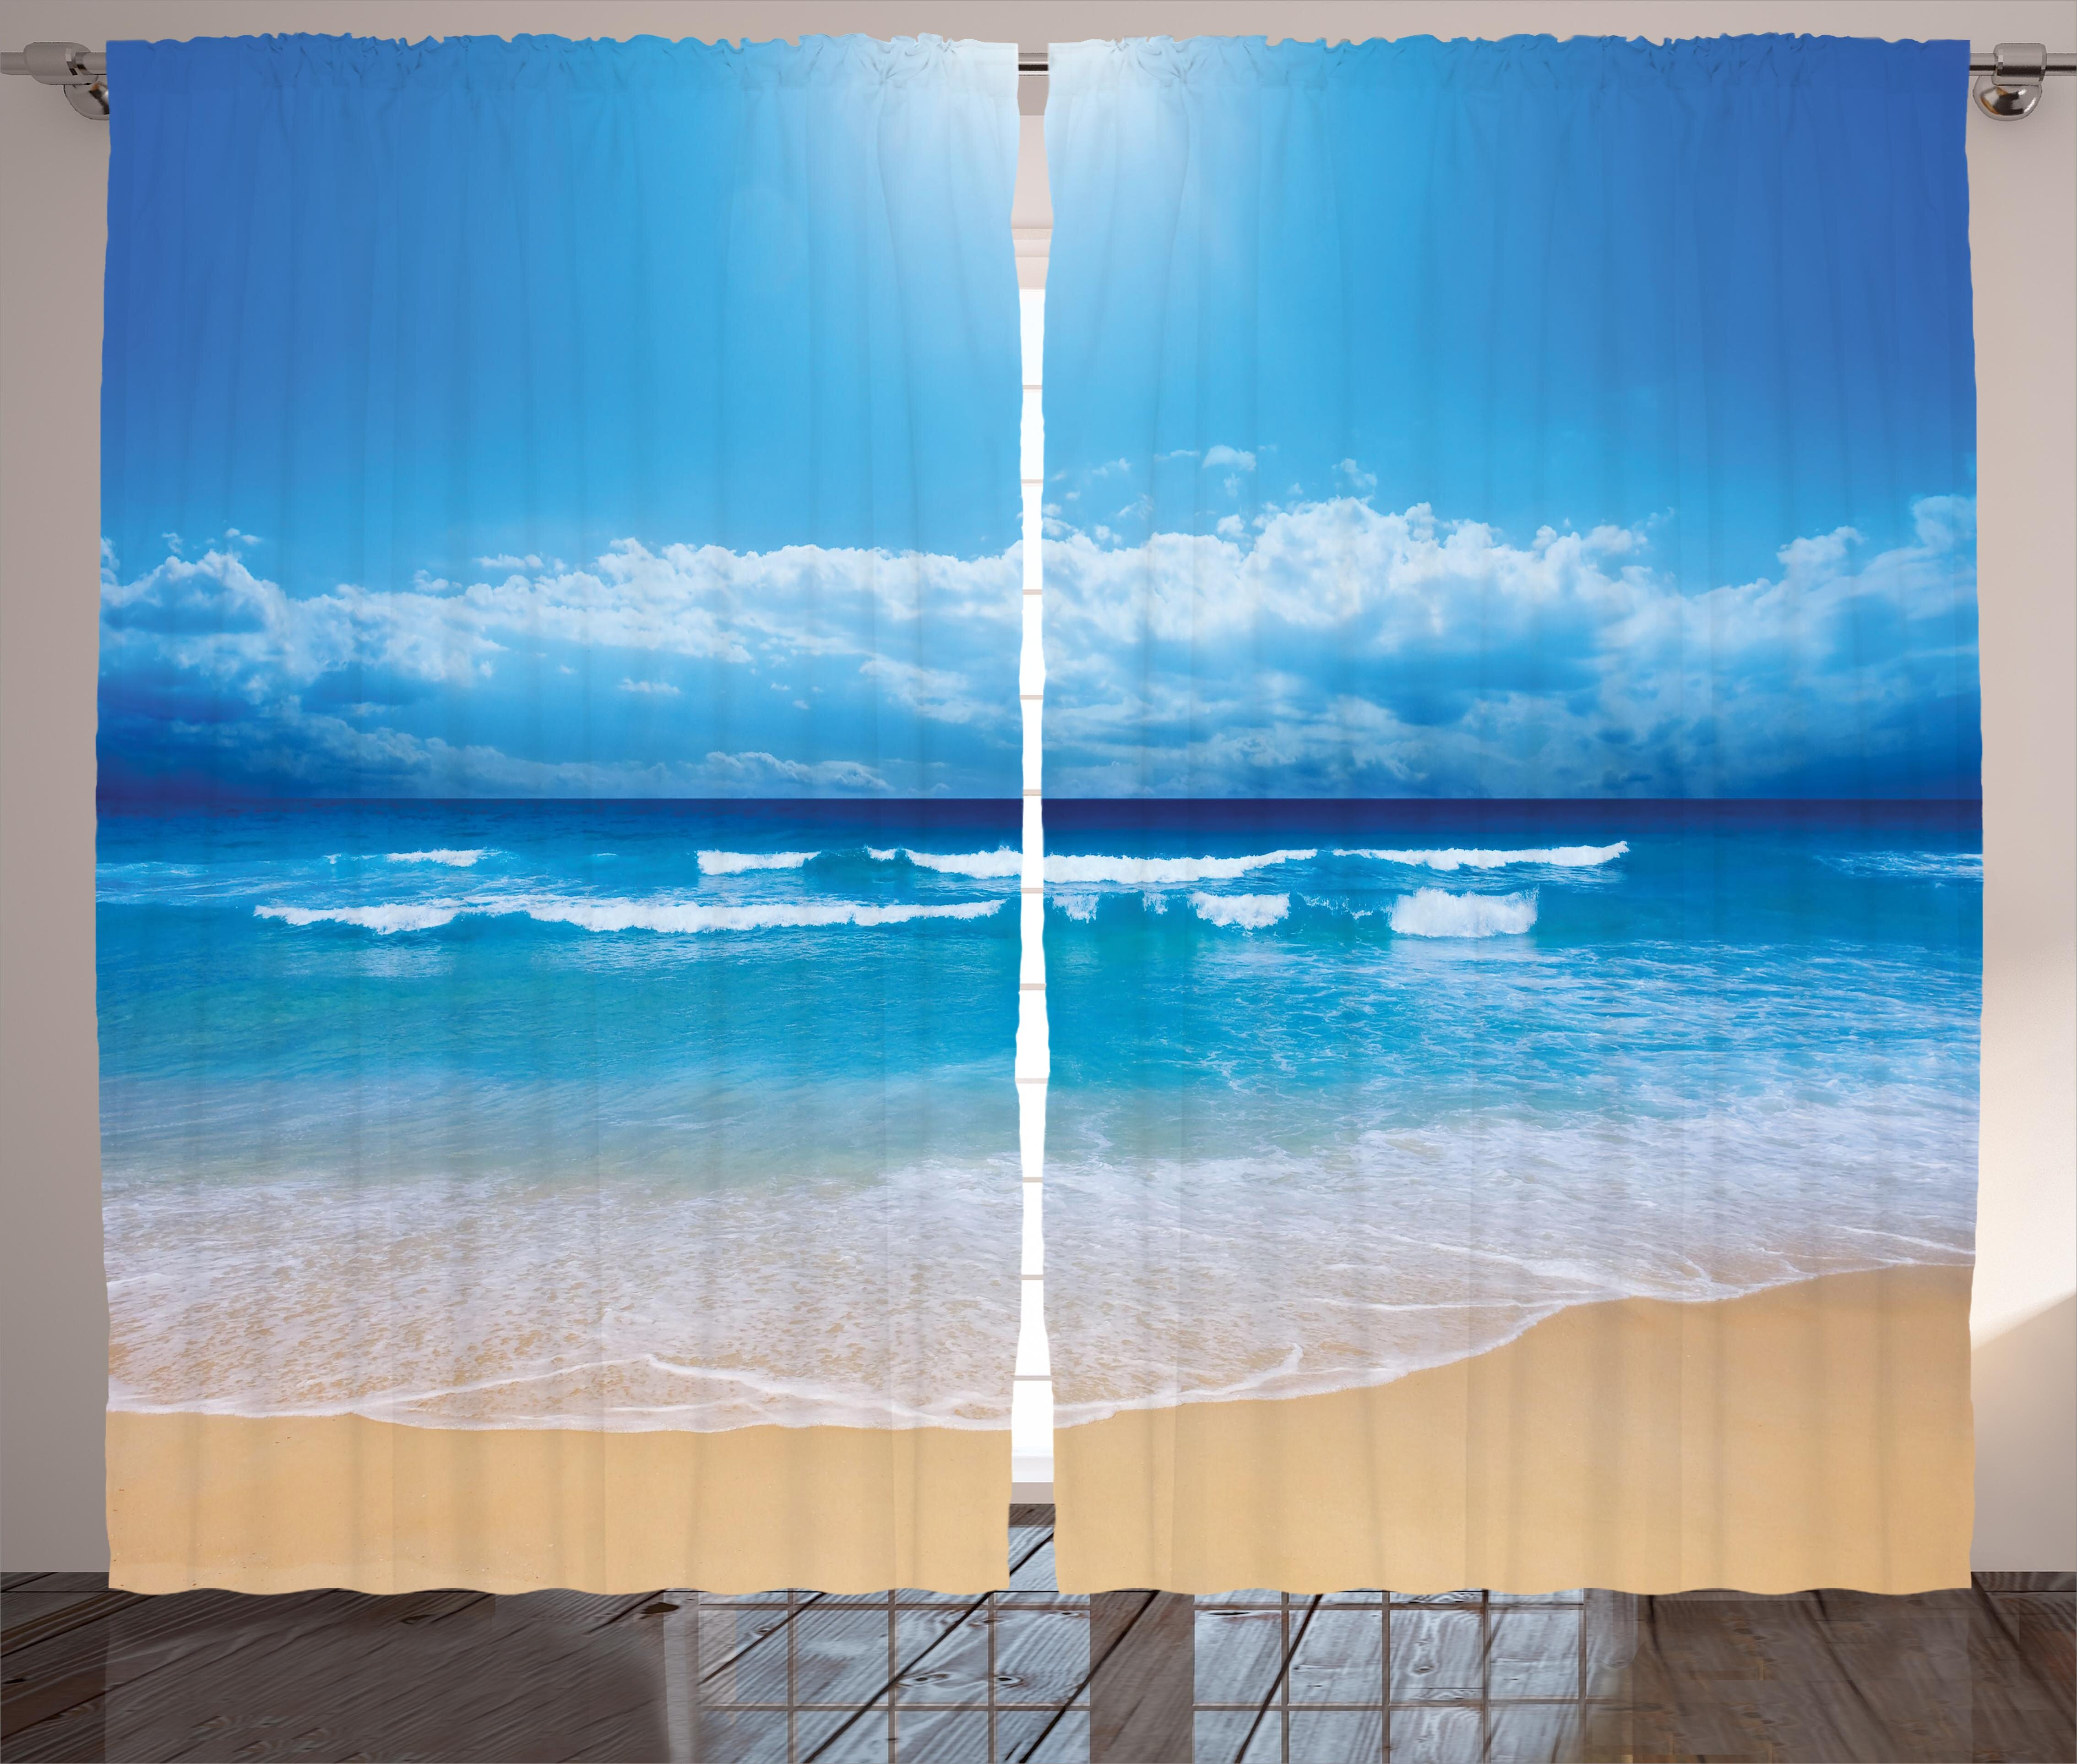 Latitude Run Grandwood Beach Seascape Theme Landscape Of The Beach And The Cloudy Sky In Summer Digital Print Graphic Print Text Semi Sheer Rod Pocket Curtain Panels Reviews Wayfair